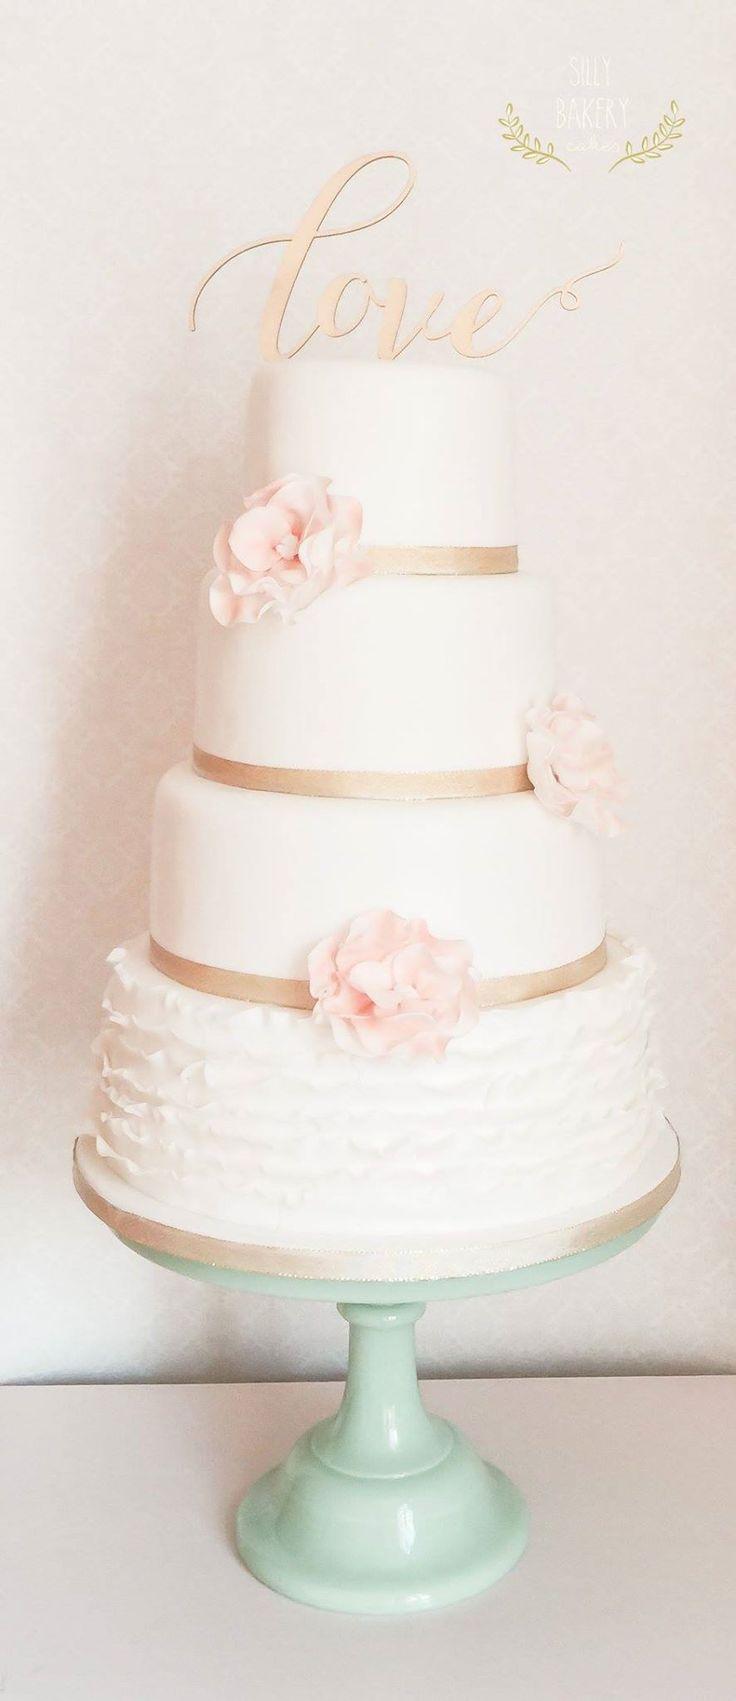 soft romantic wedding cake; via Silly Bakery Cakes